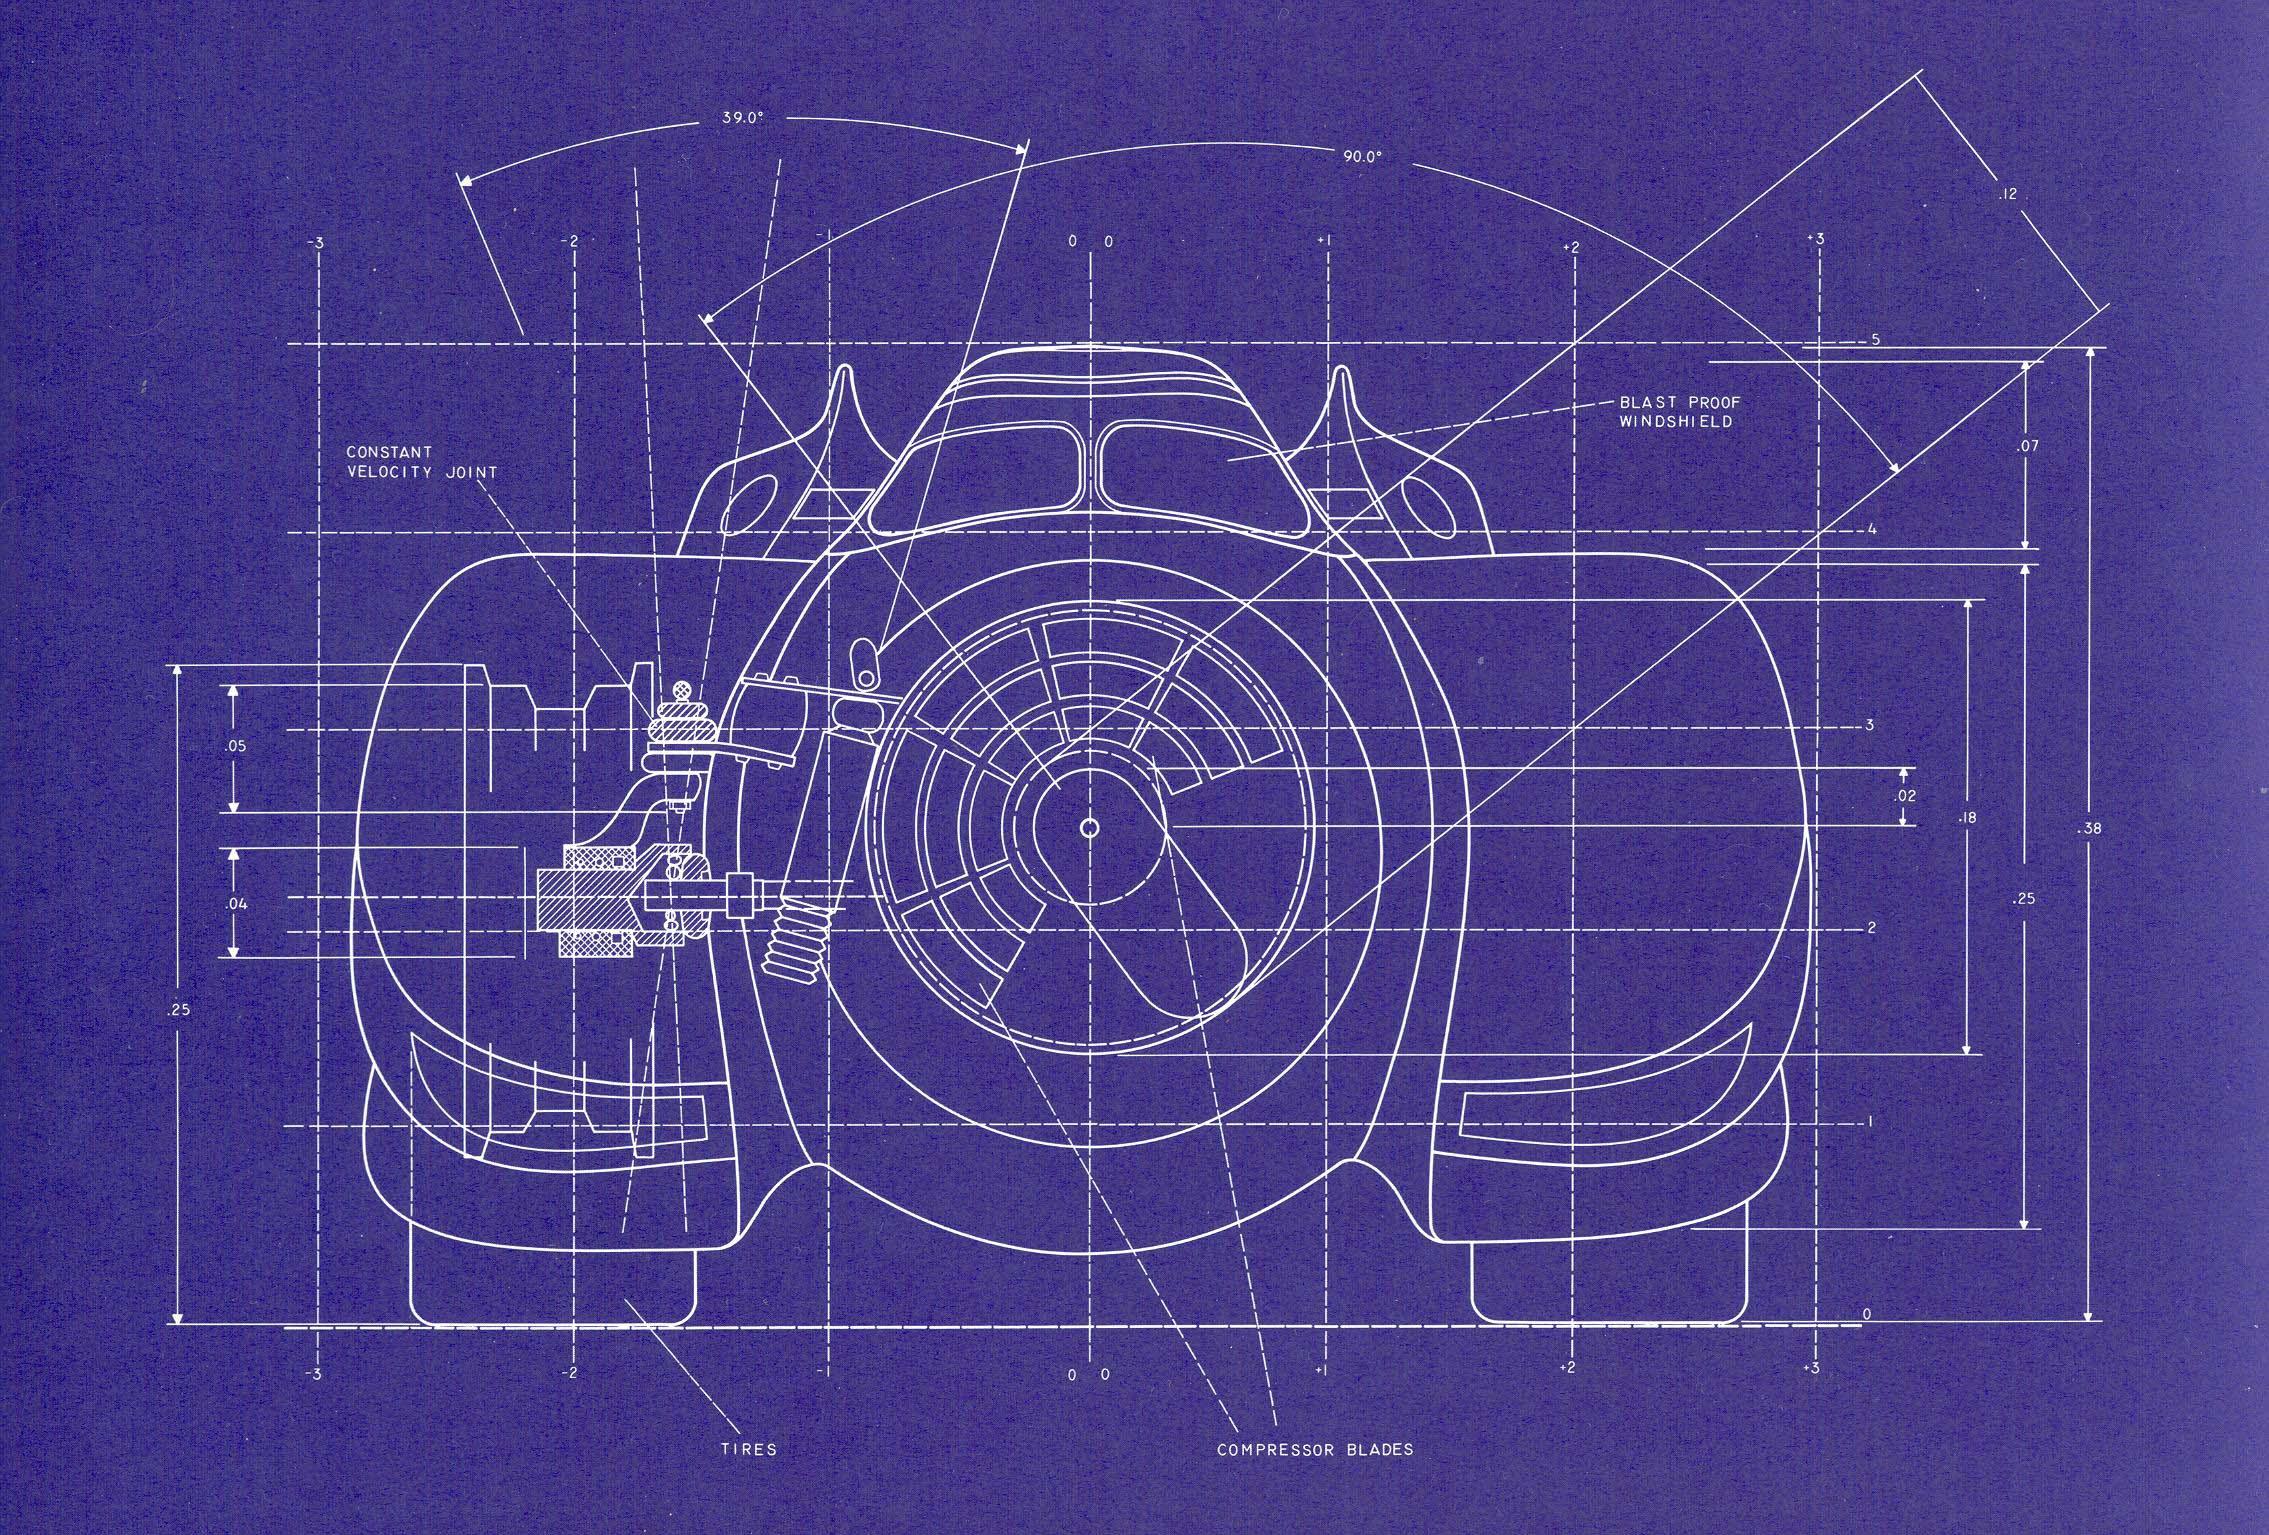 Blueprint batimovil blueprint batimovil sideblueprintg blueprint batimovil frontblueprintg malvernweather Image collections